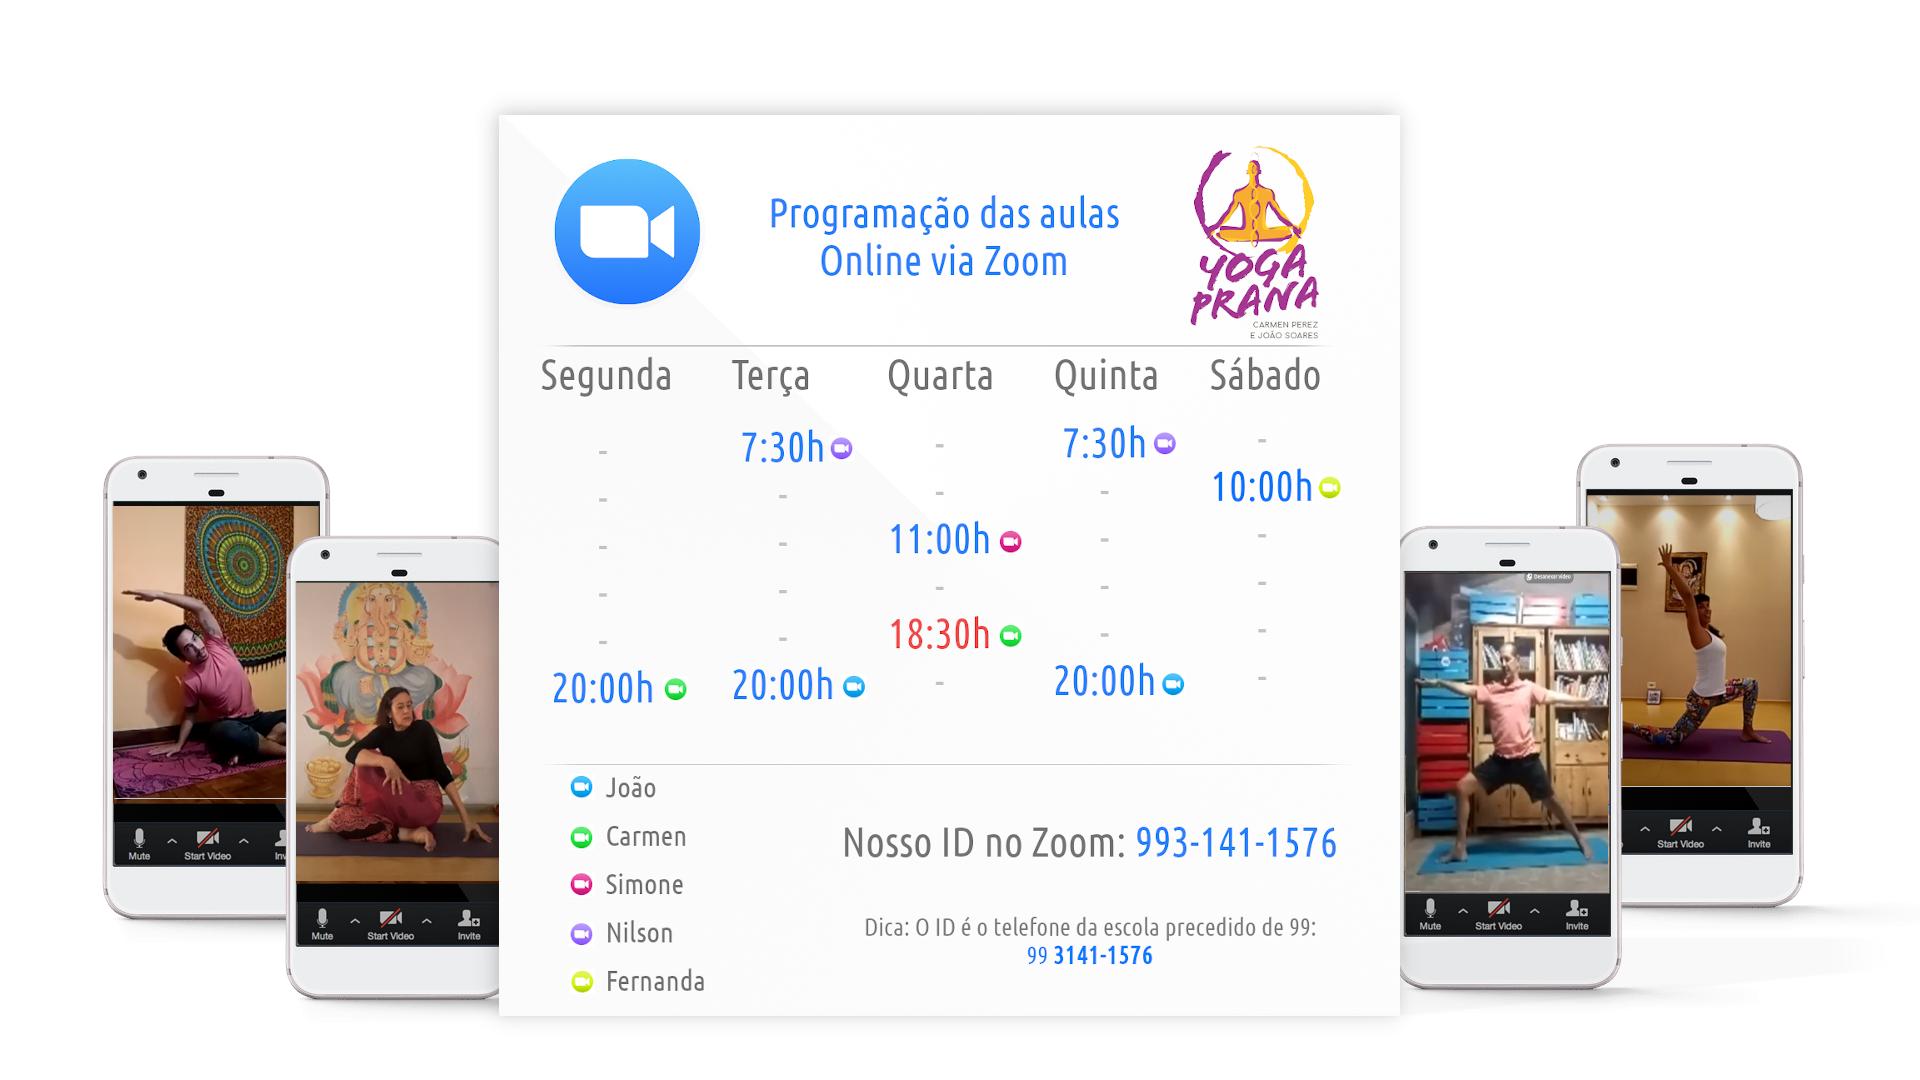 aulas-yogaprana-zoom-horario-3